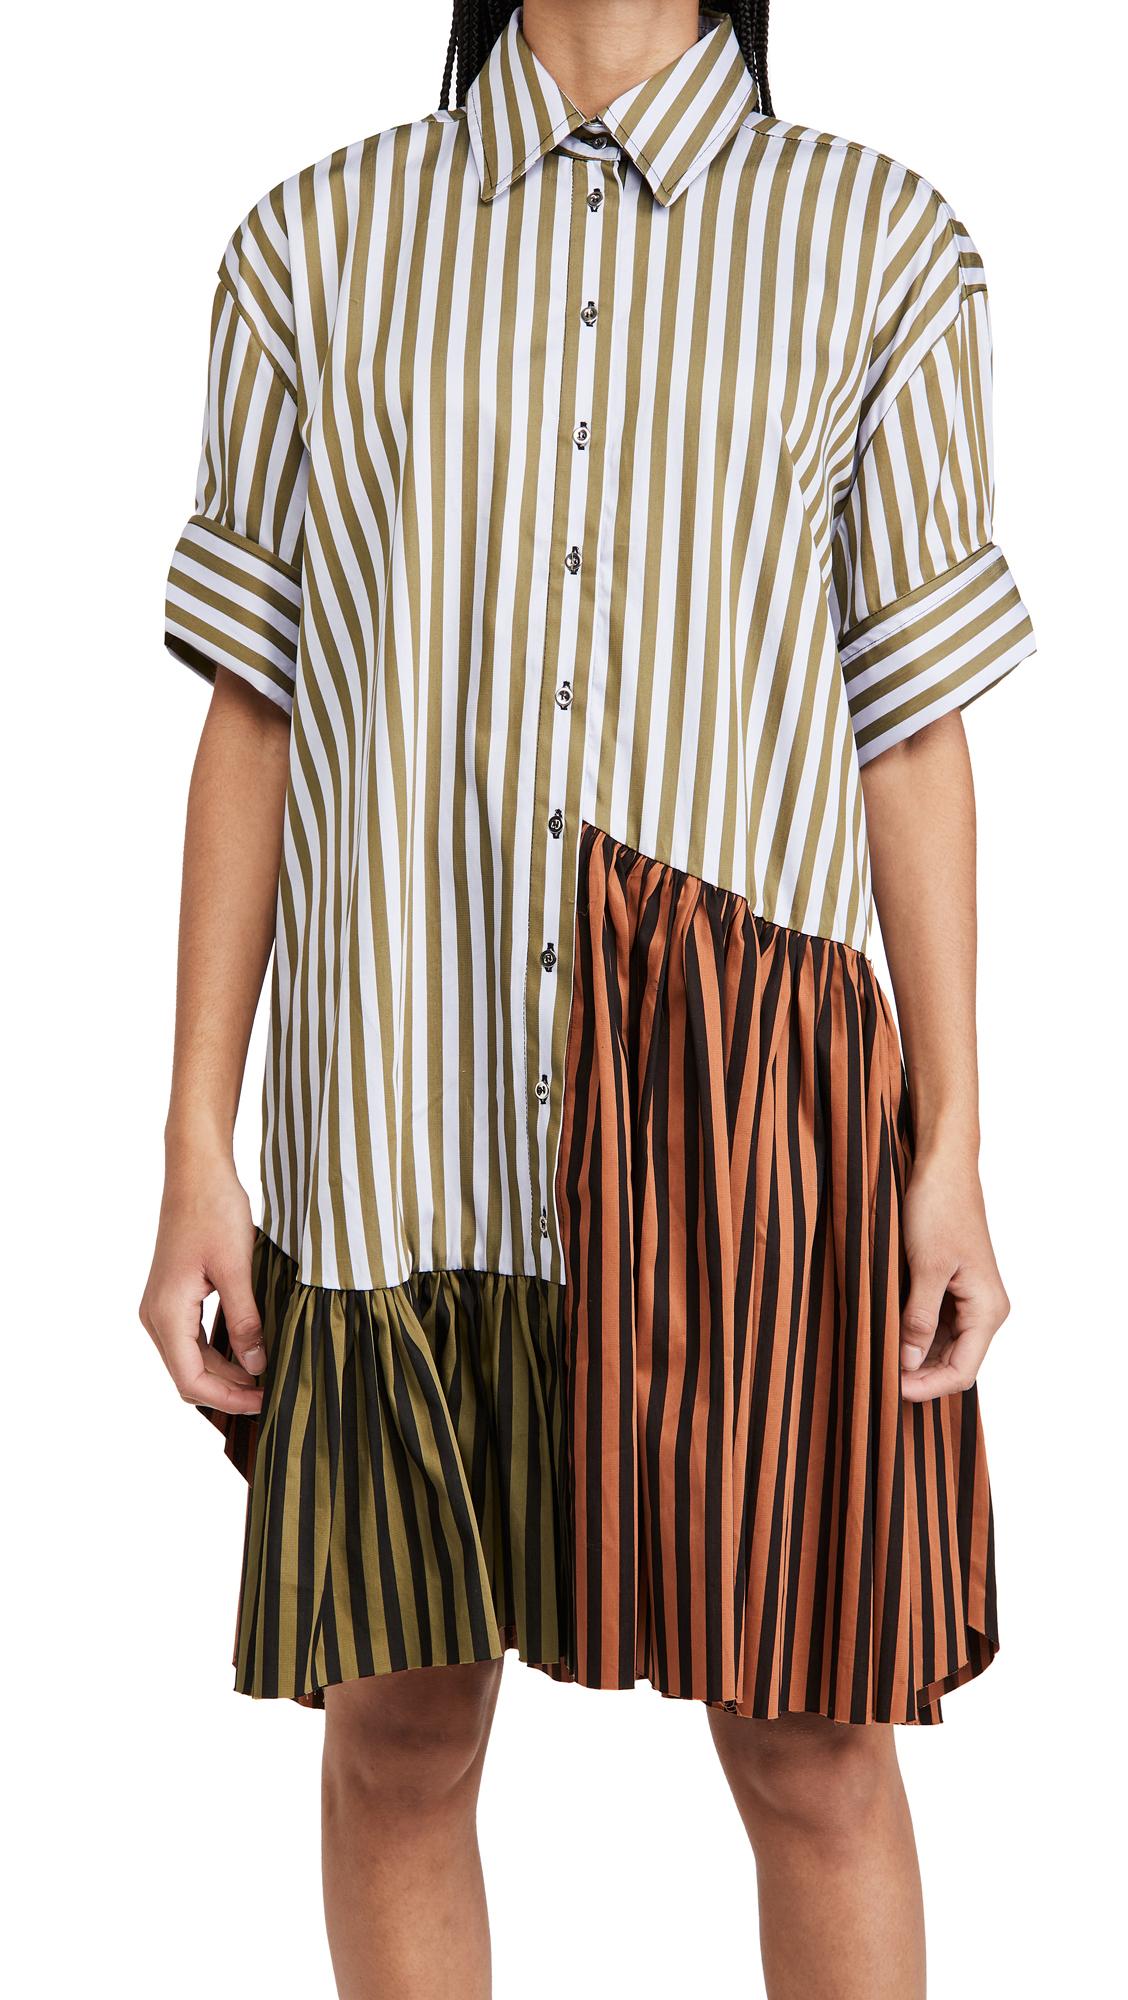 Marques Almeida Patchwork Shirt